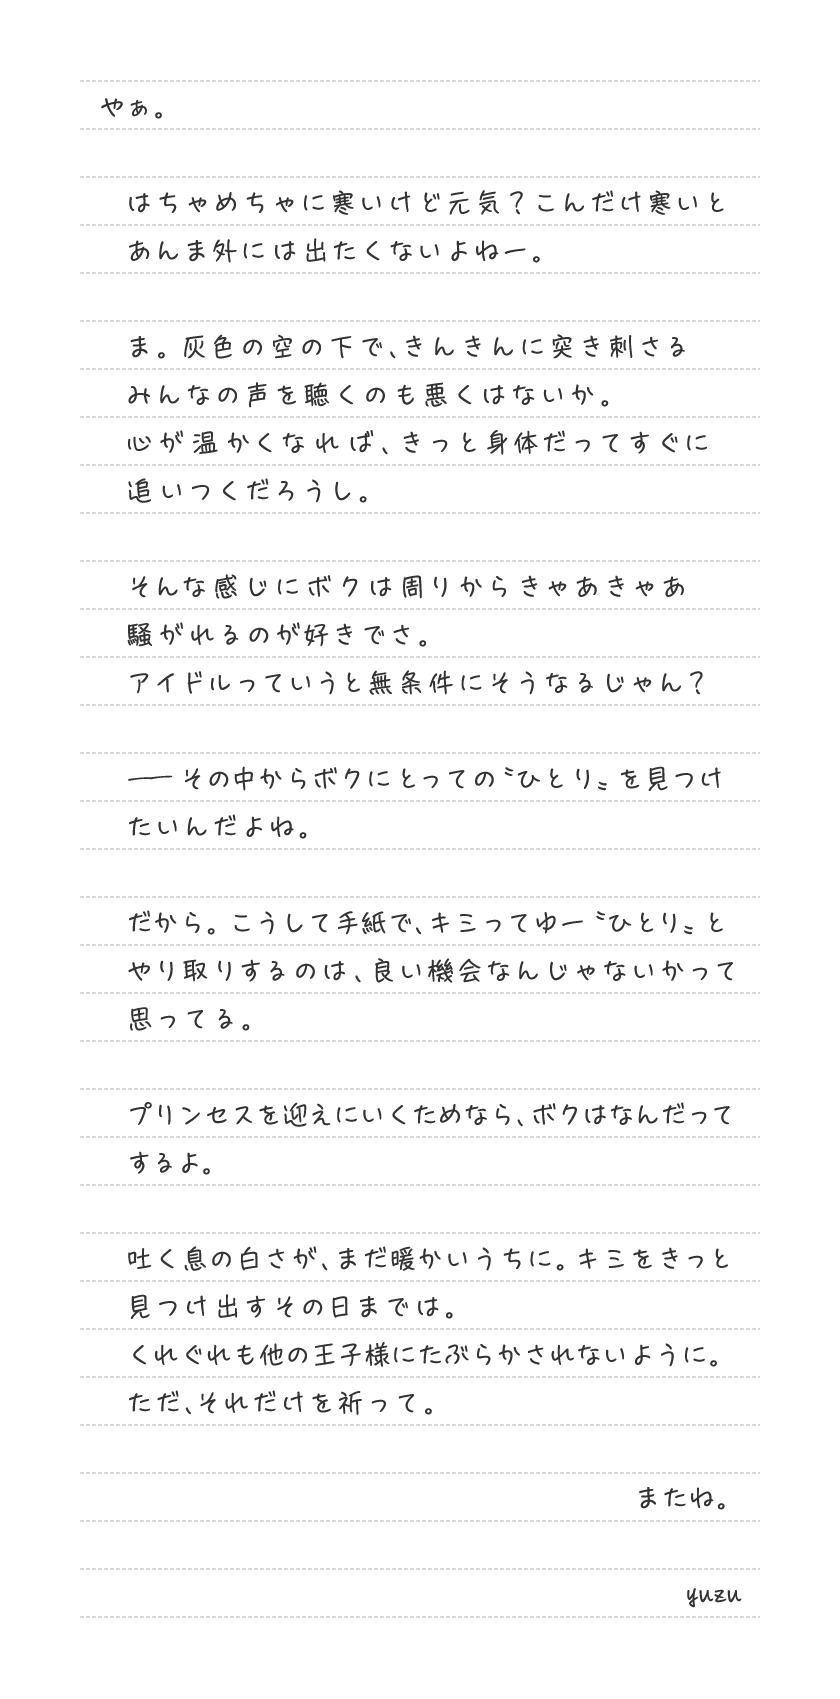 yuzuの手紙